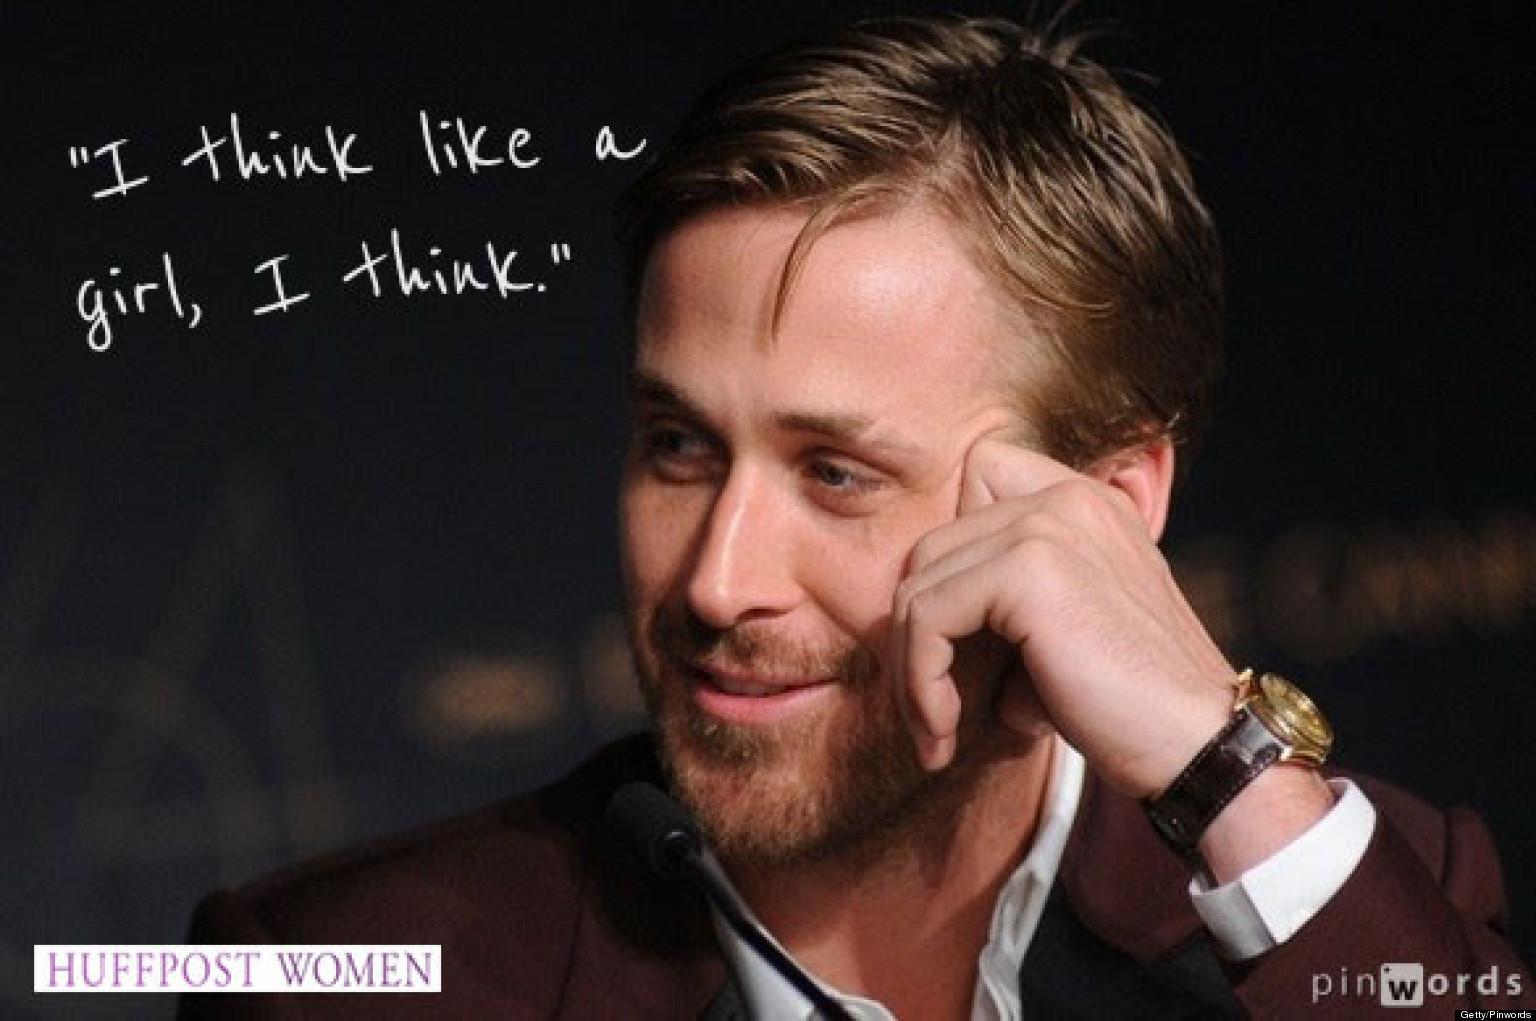 Great Job Funny Meme Ryan Gosling : Hey girl foursquare ryan gosling memes should be on your radar pics